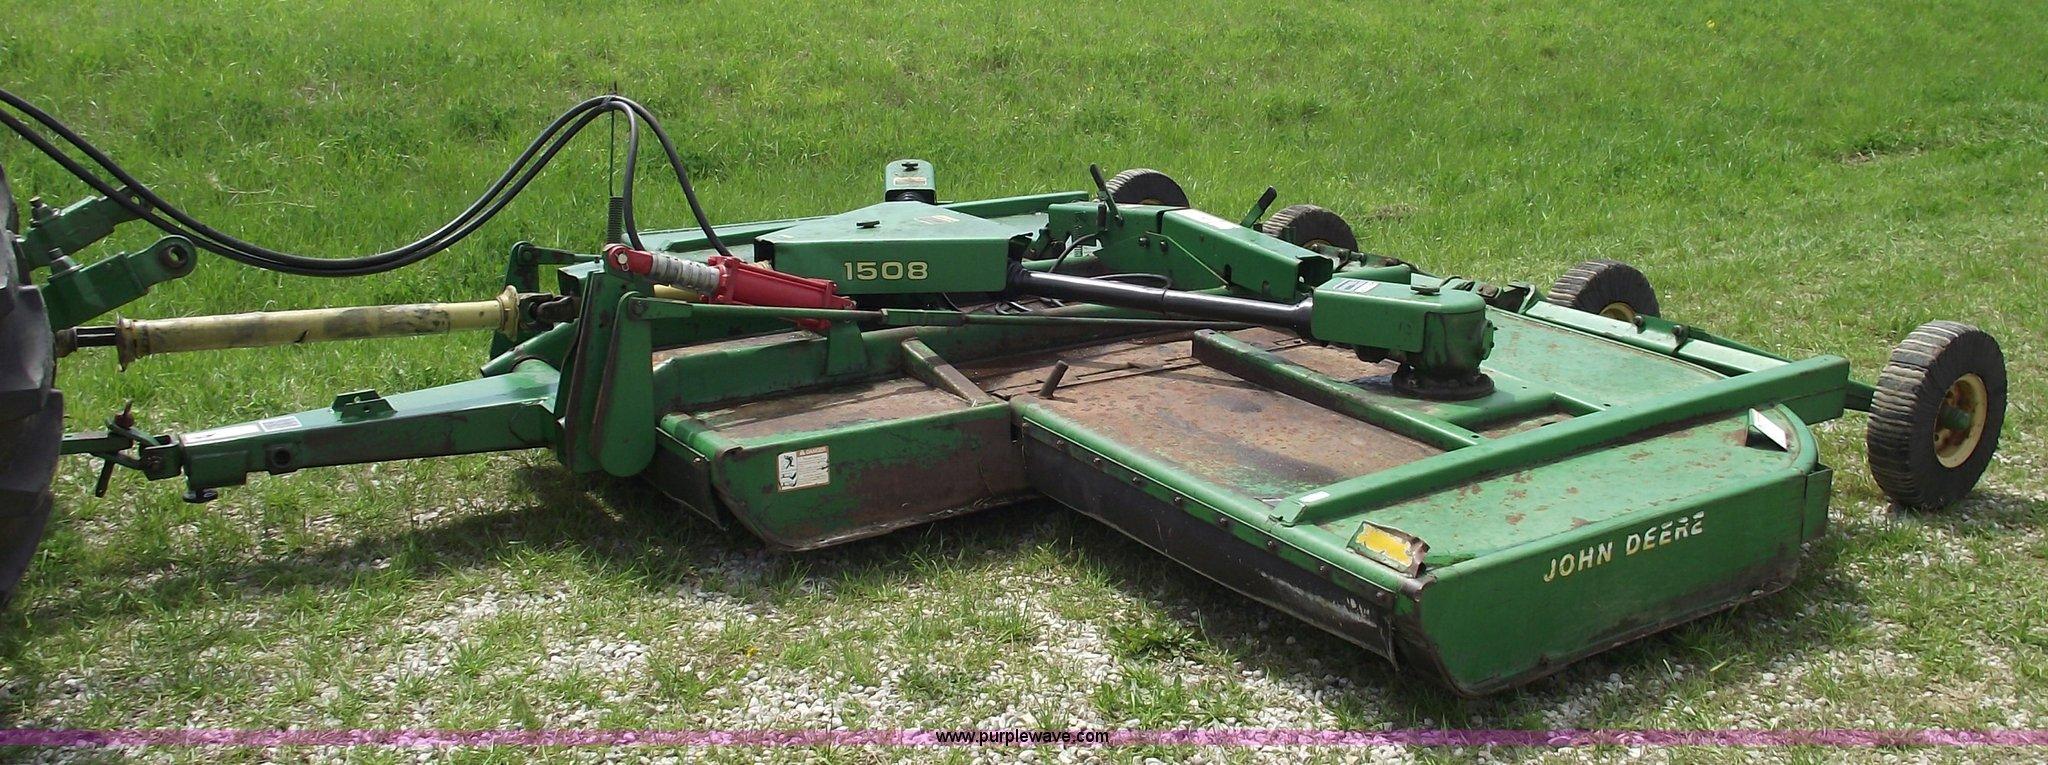 John Deere 1508 15' bat wing rotary mower | Item 5442 | SOLD